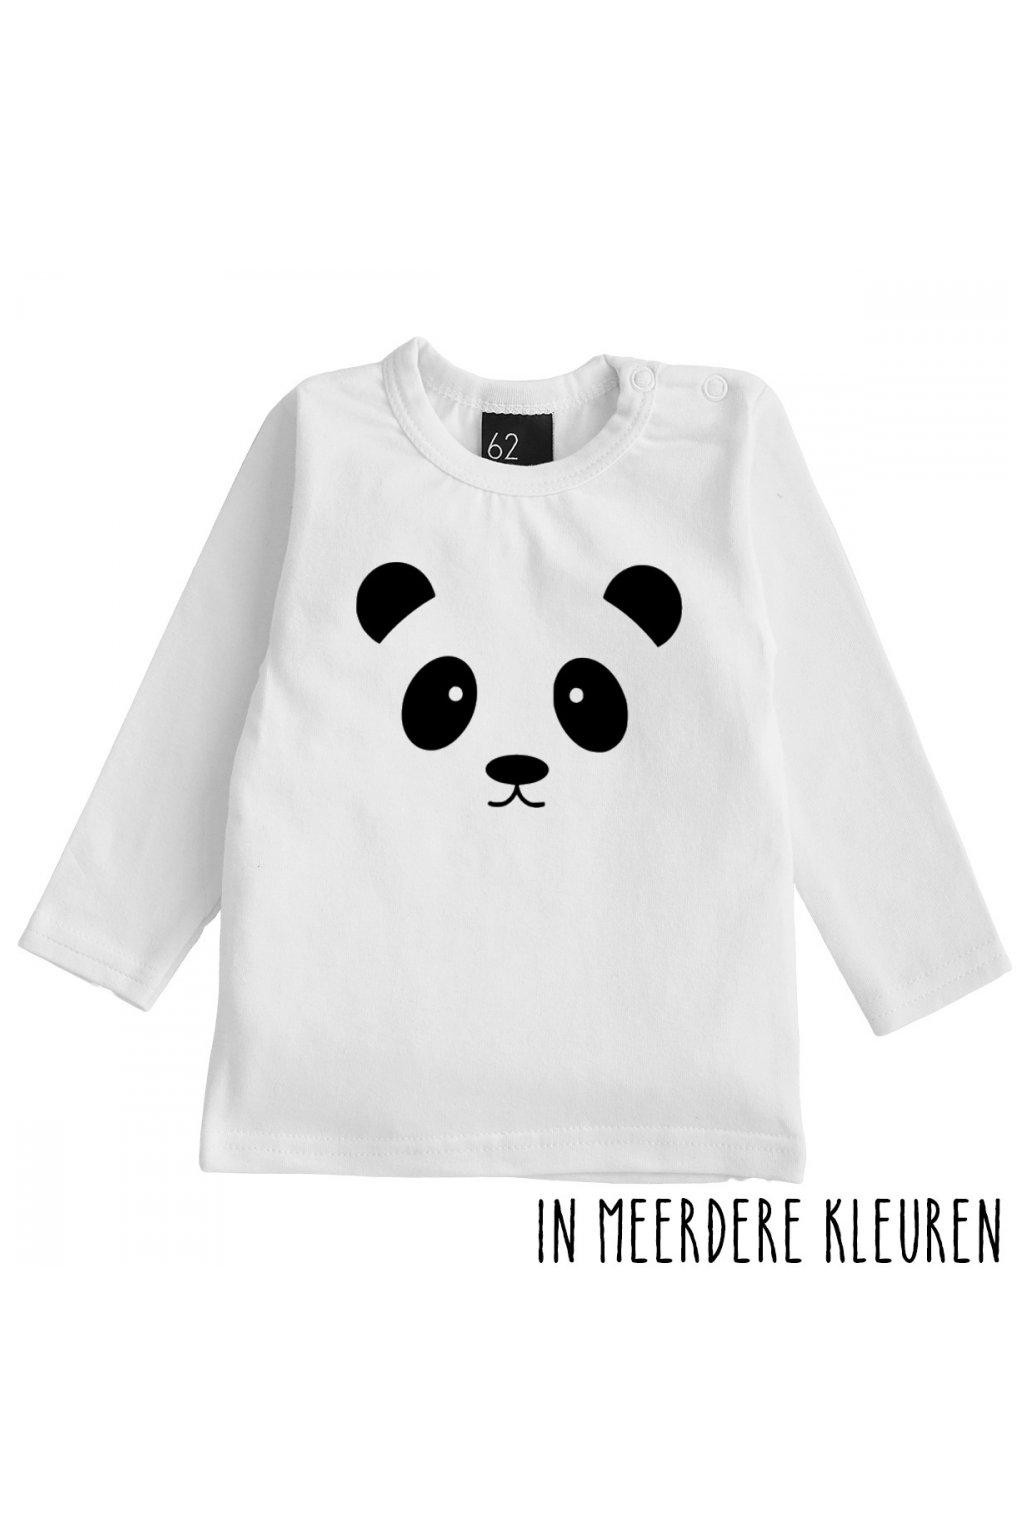 panda longsleeve shirt babystyling wit zwart